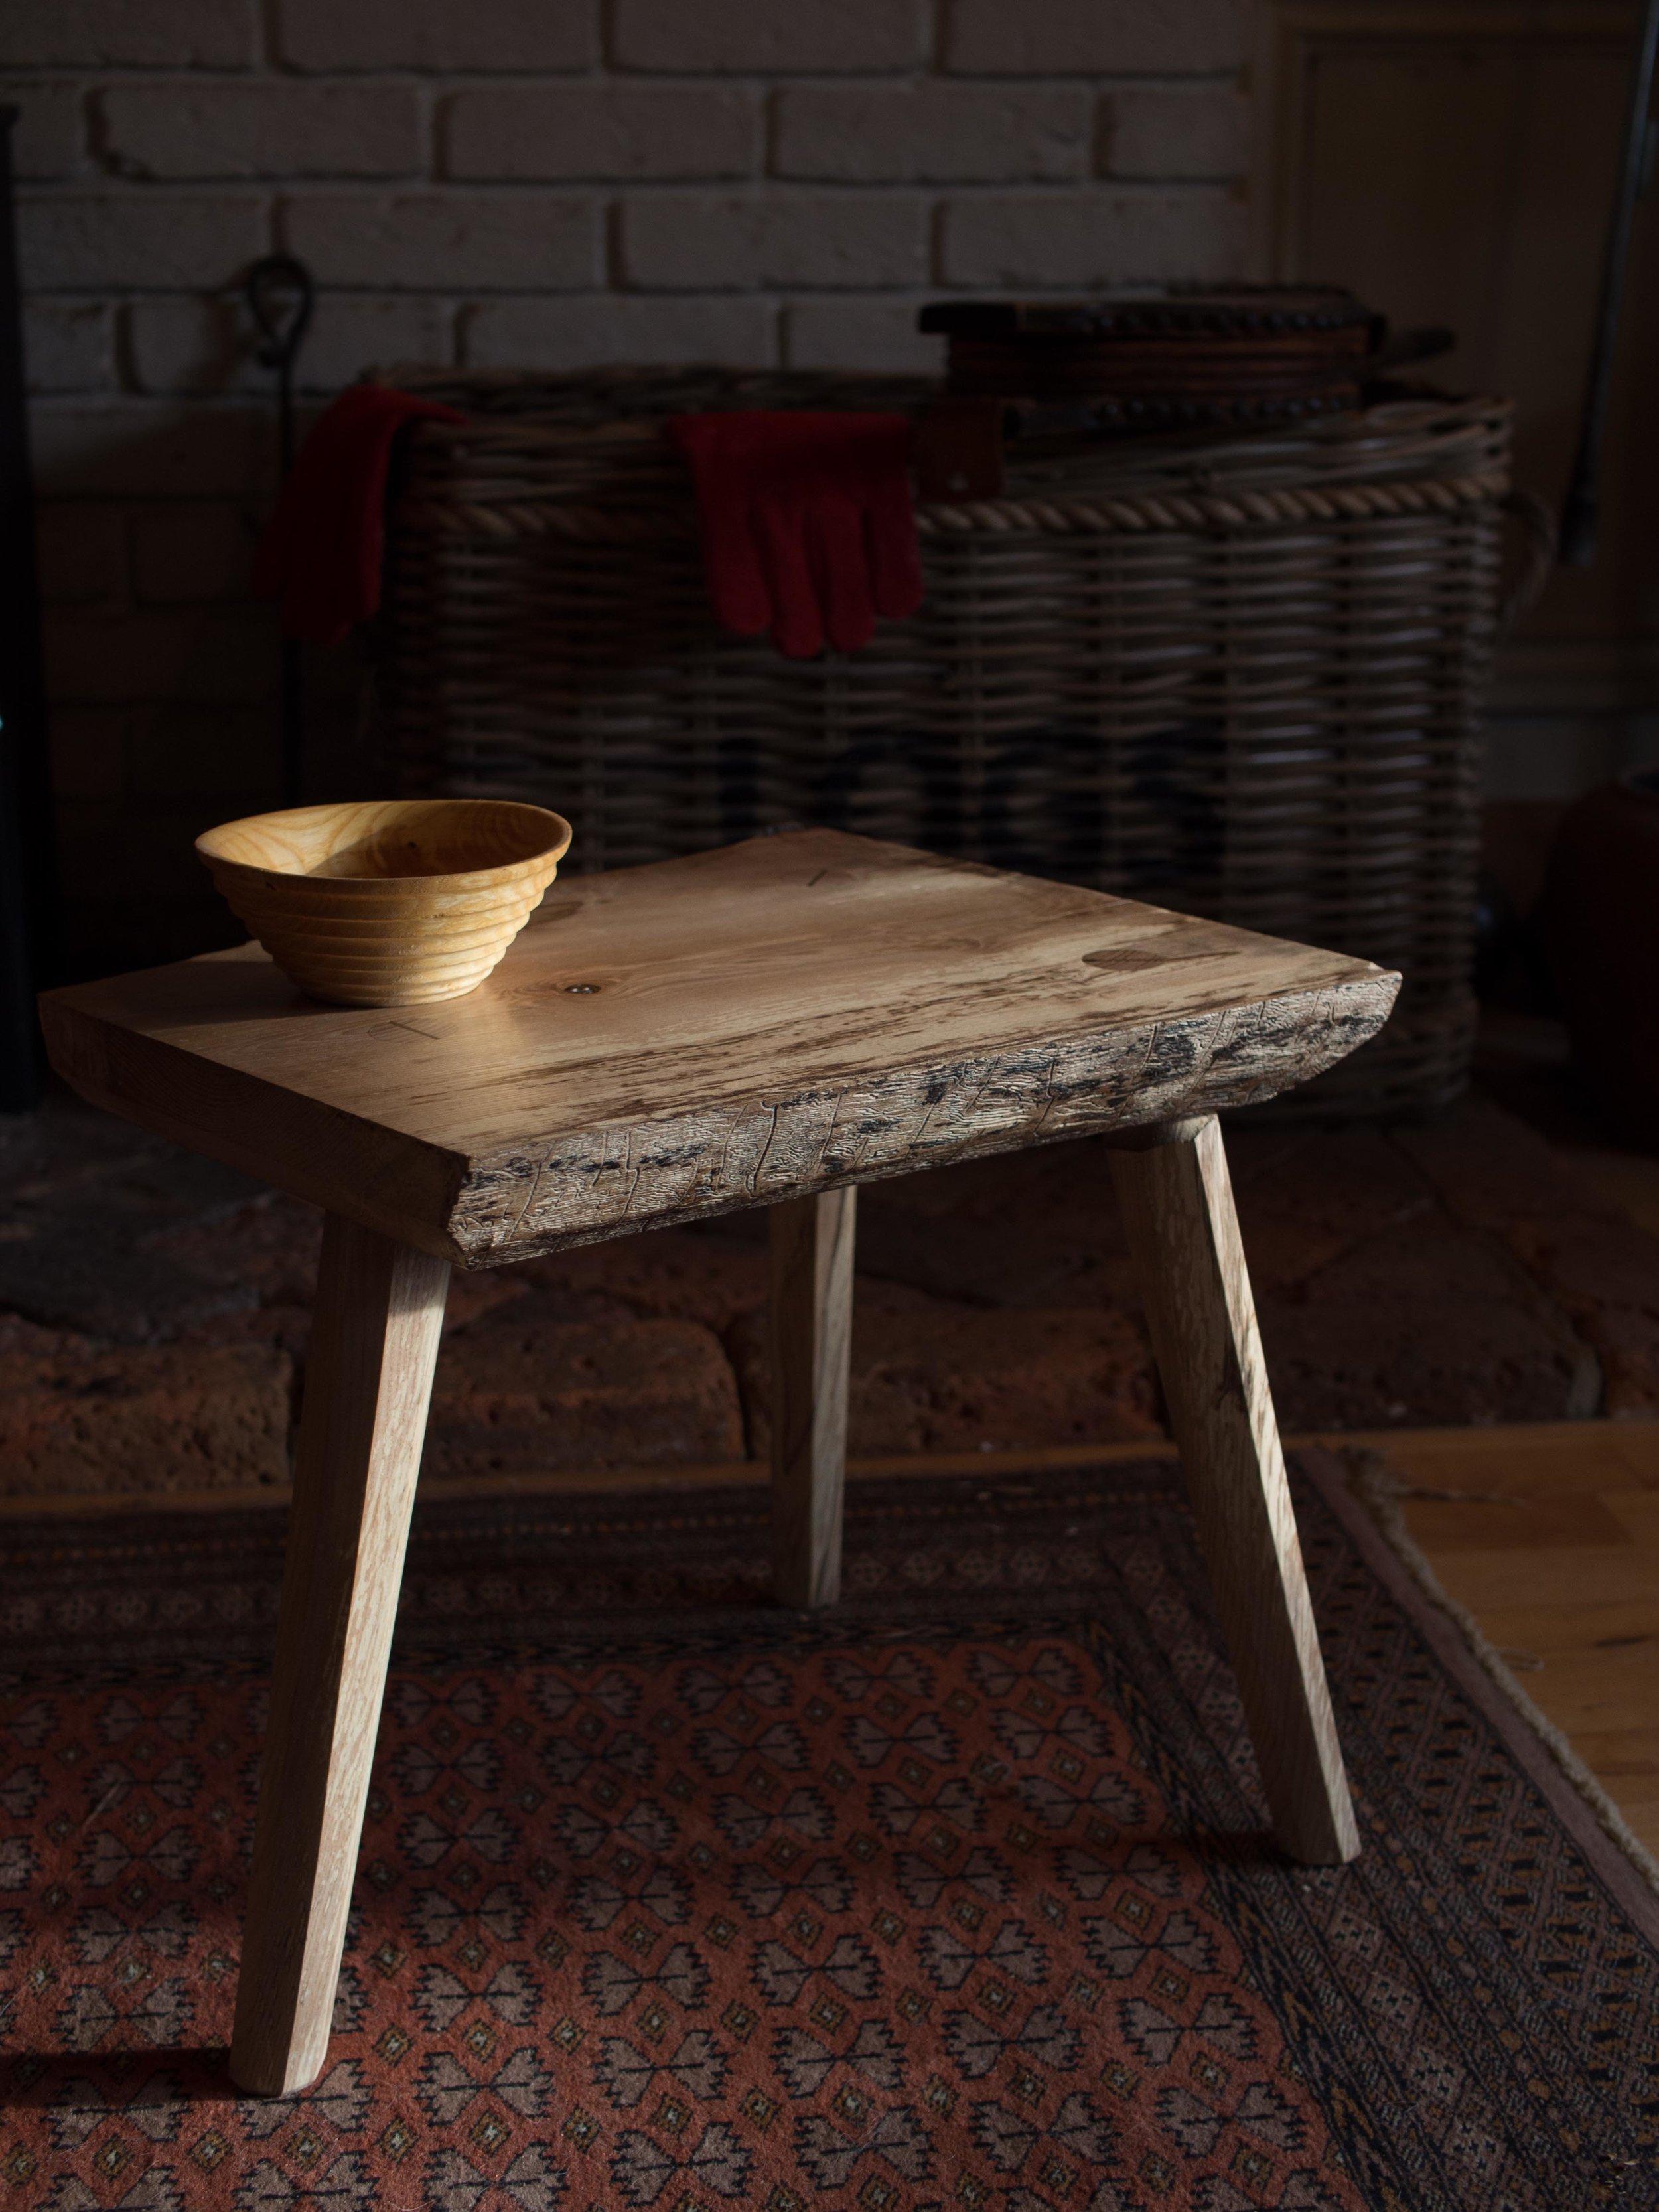 Harry GD stool and bowl.jpg